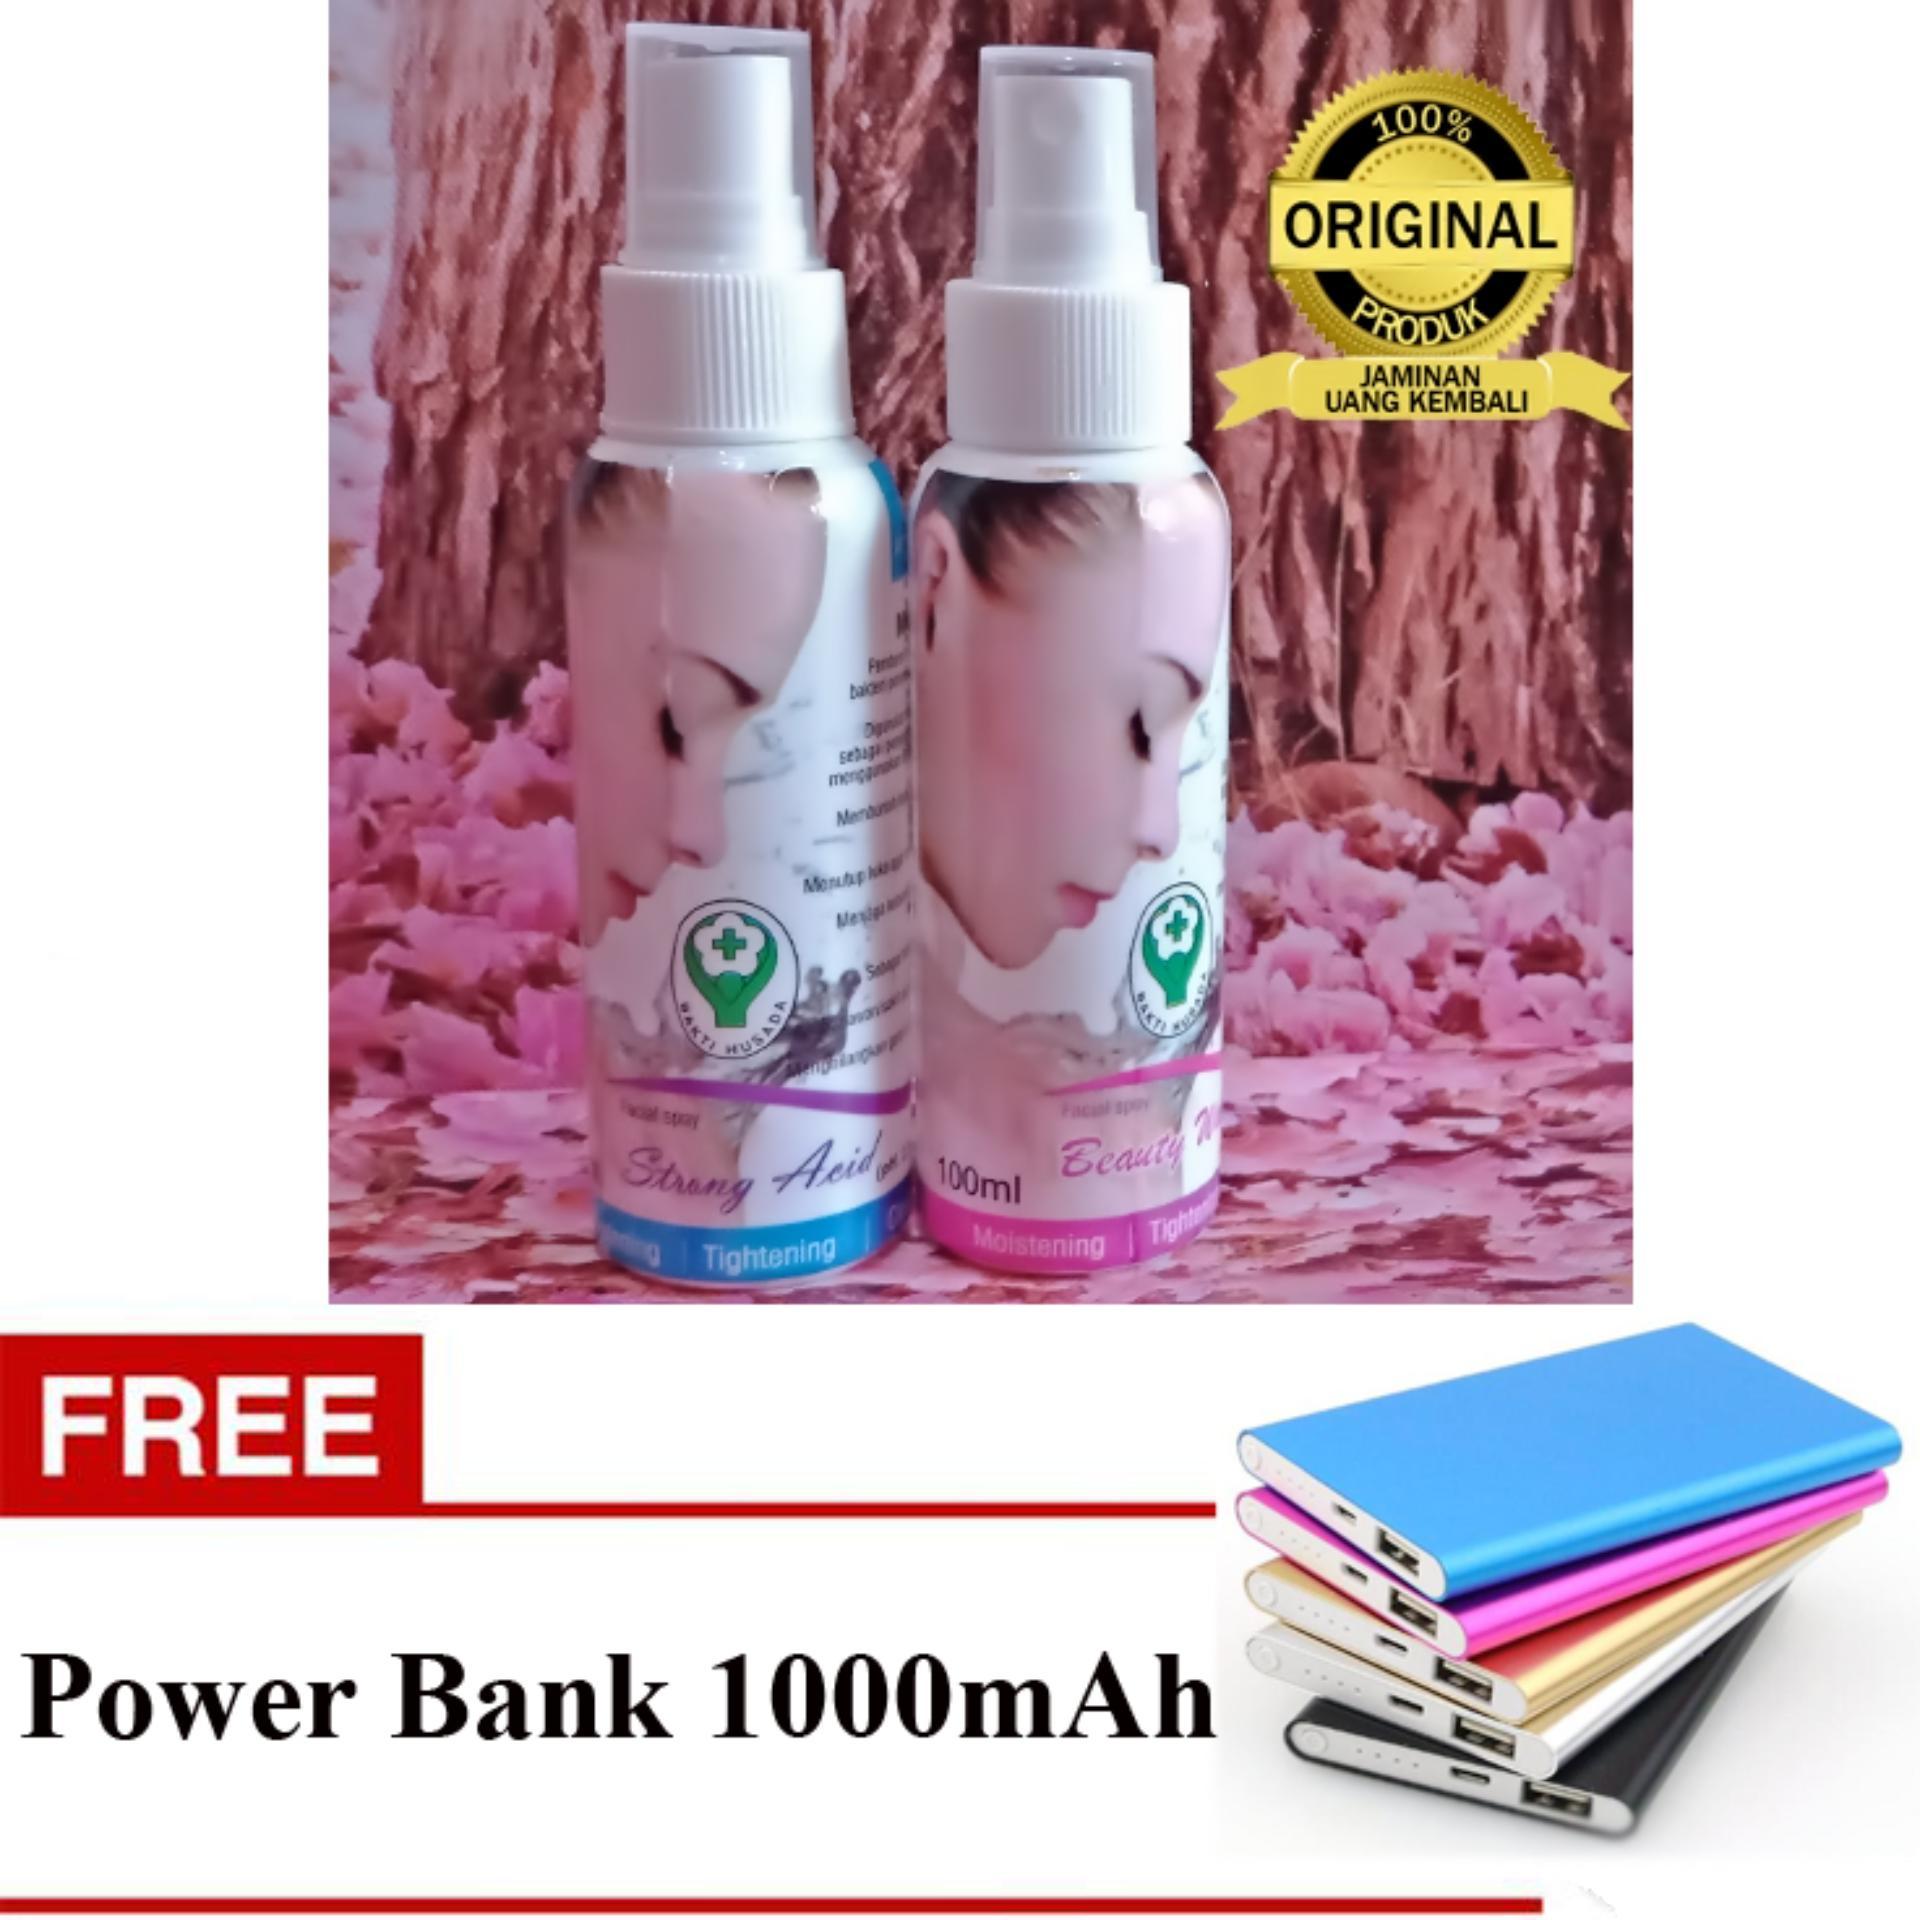 Paket Water Strong Acid dan Beauty Water 100% AIR KANGEN ASLI